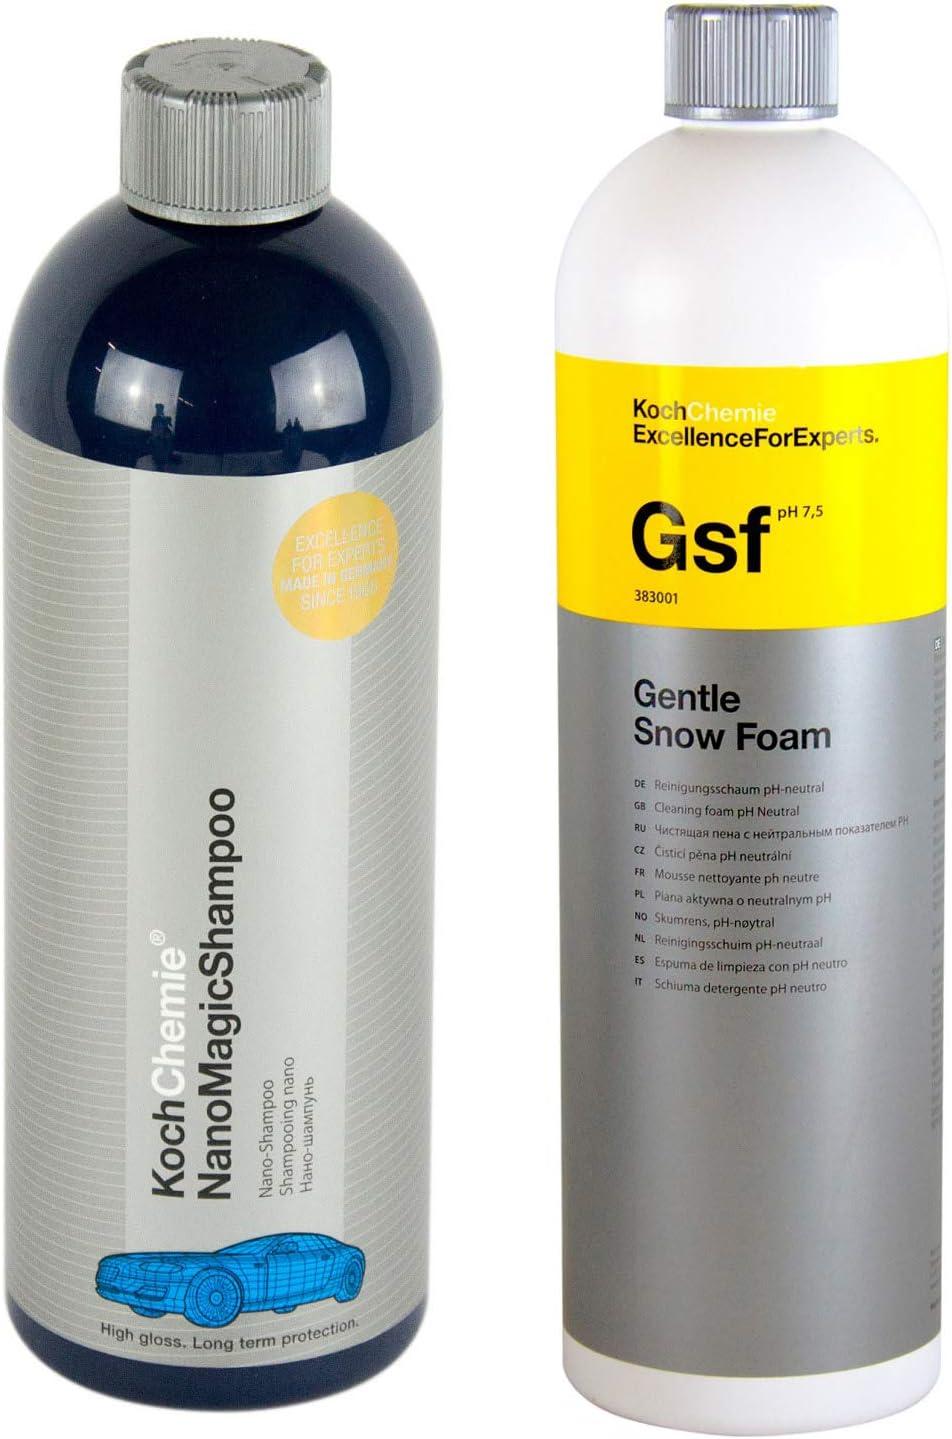 Koch Chemie Nano Magic Shampoo 750 Ml Gsf Gentle Snow Foam Shampoo 1 L Liter Auto